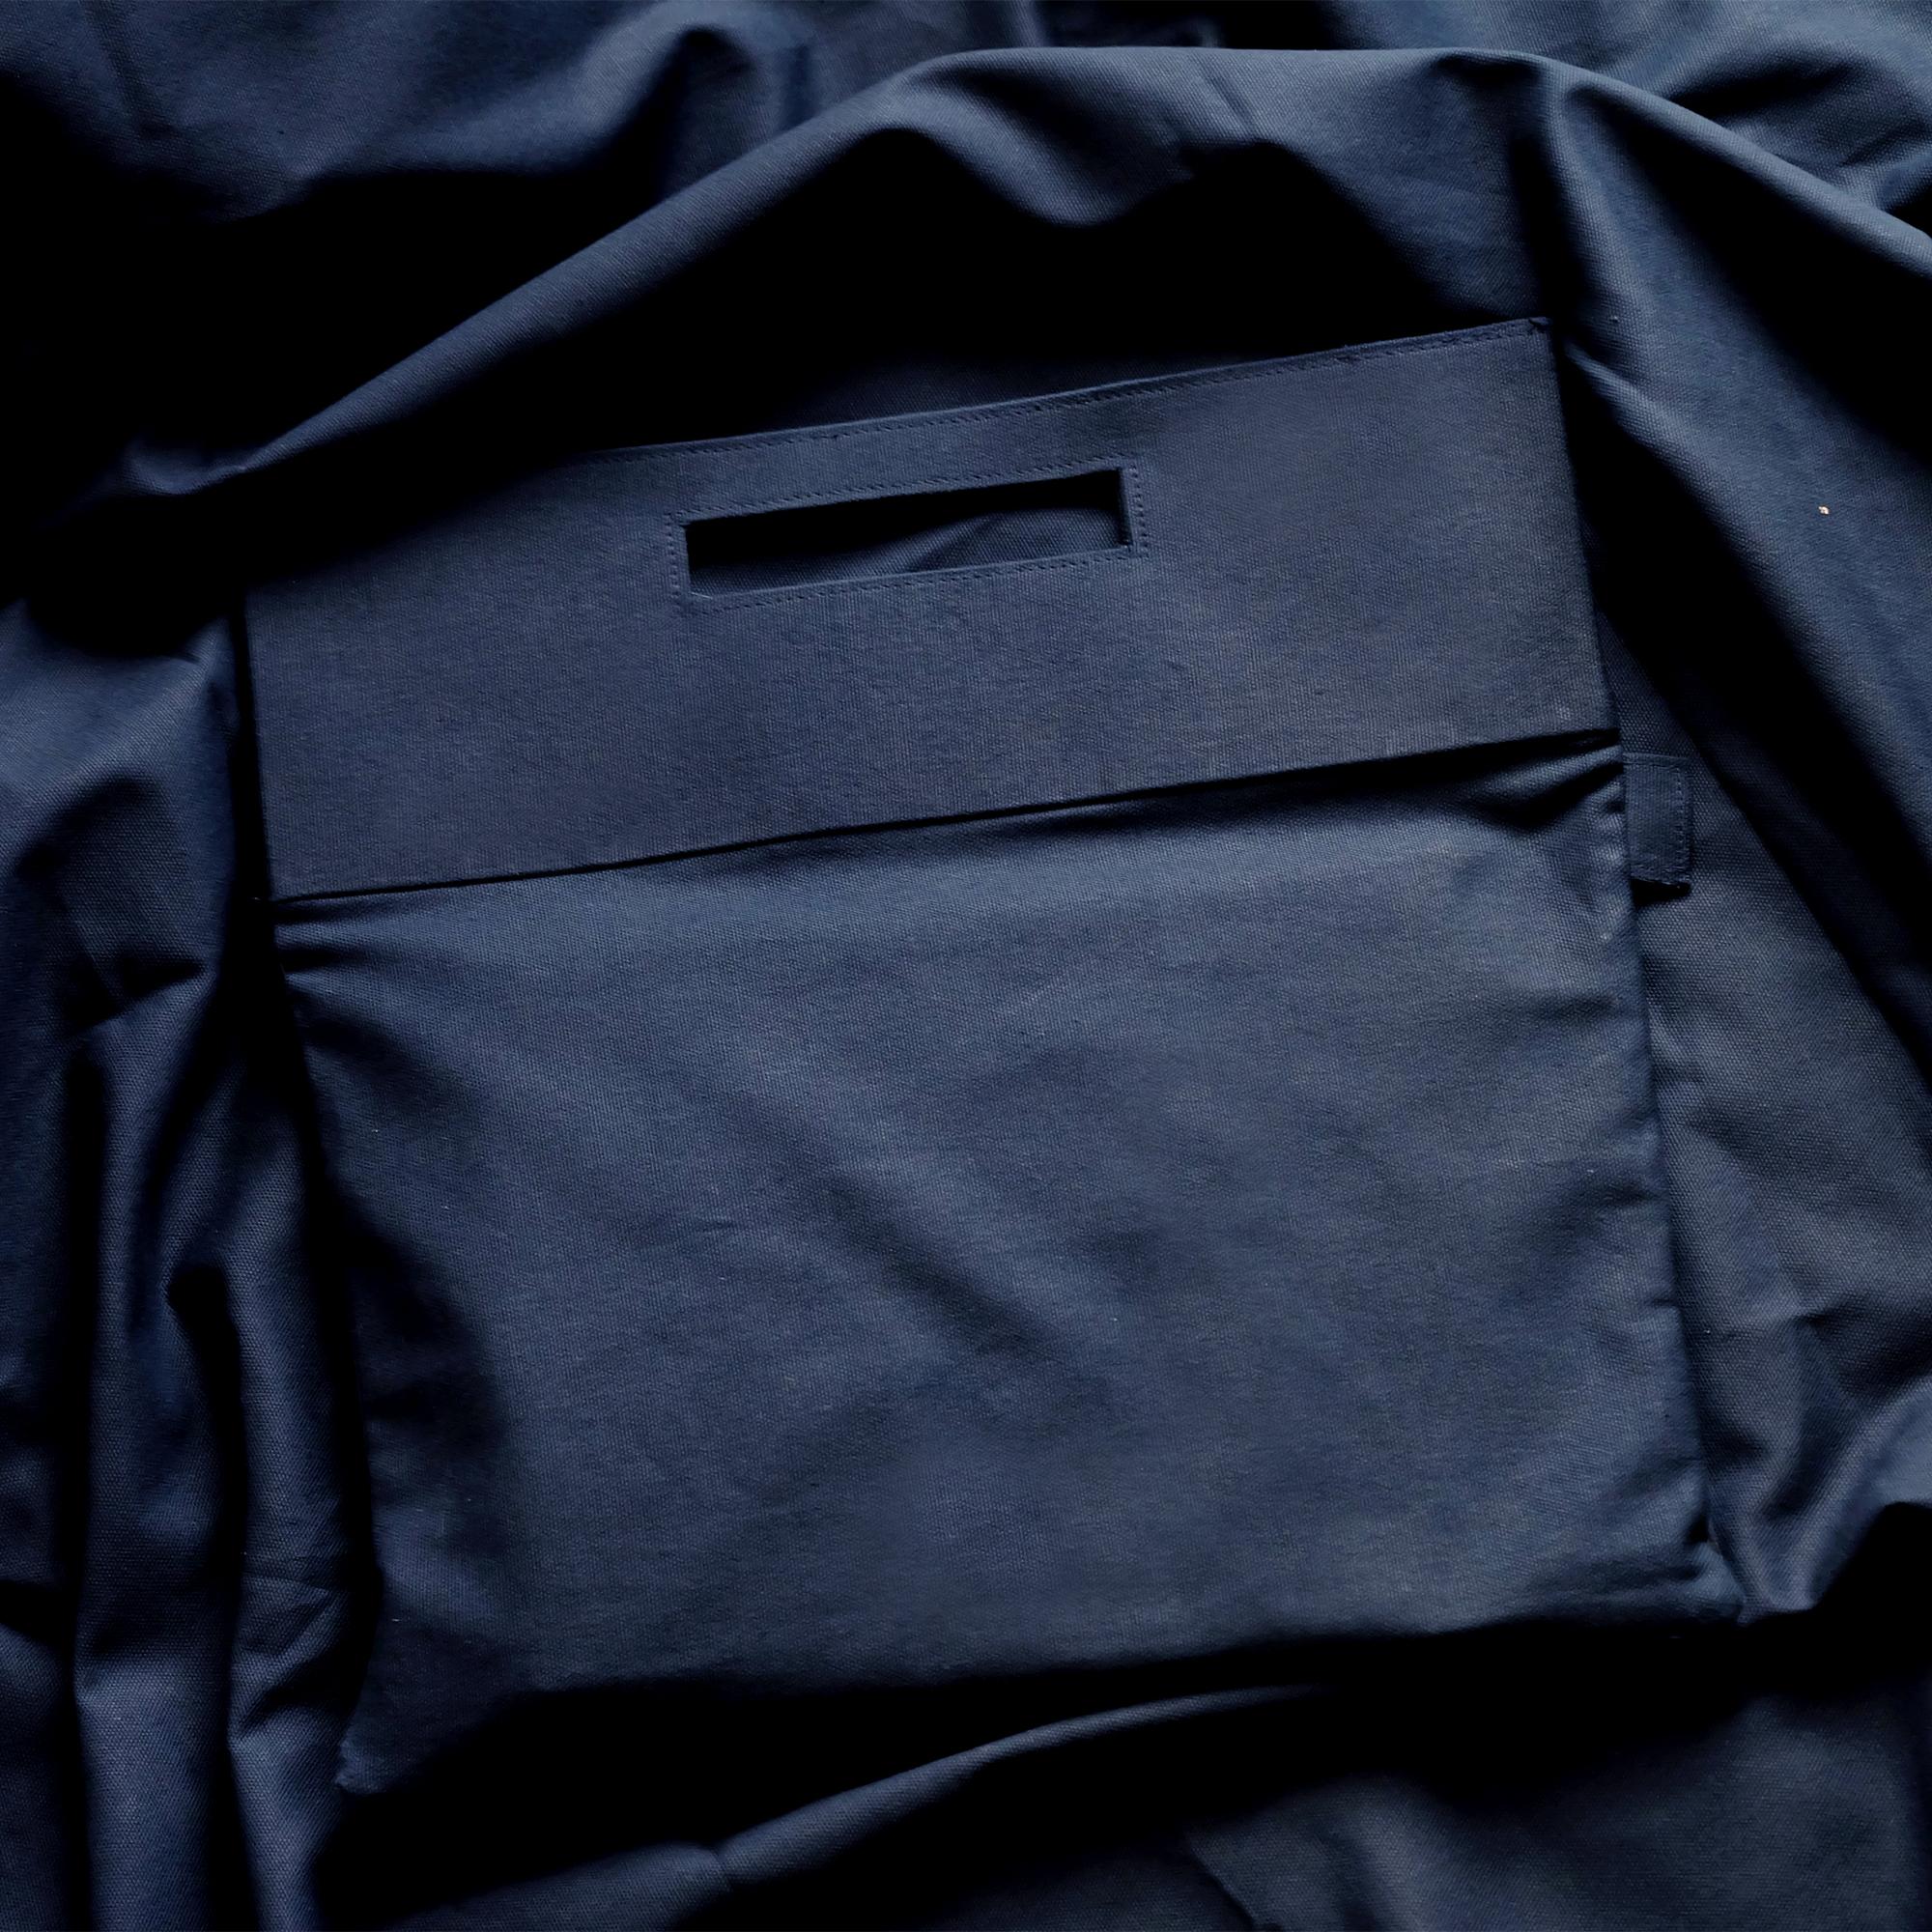 bag,กระเป๋า,กระเป๋าเอกสาร,กระเป๋าถือ,กระเป๋าใส